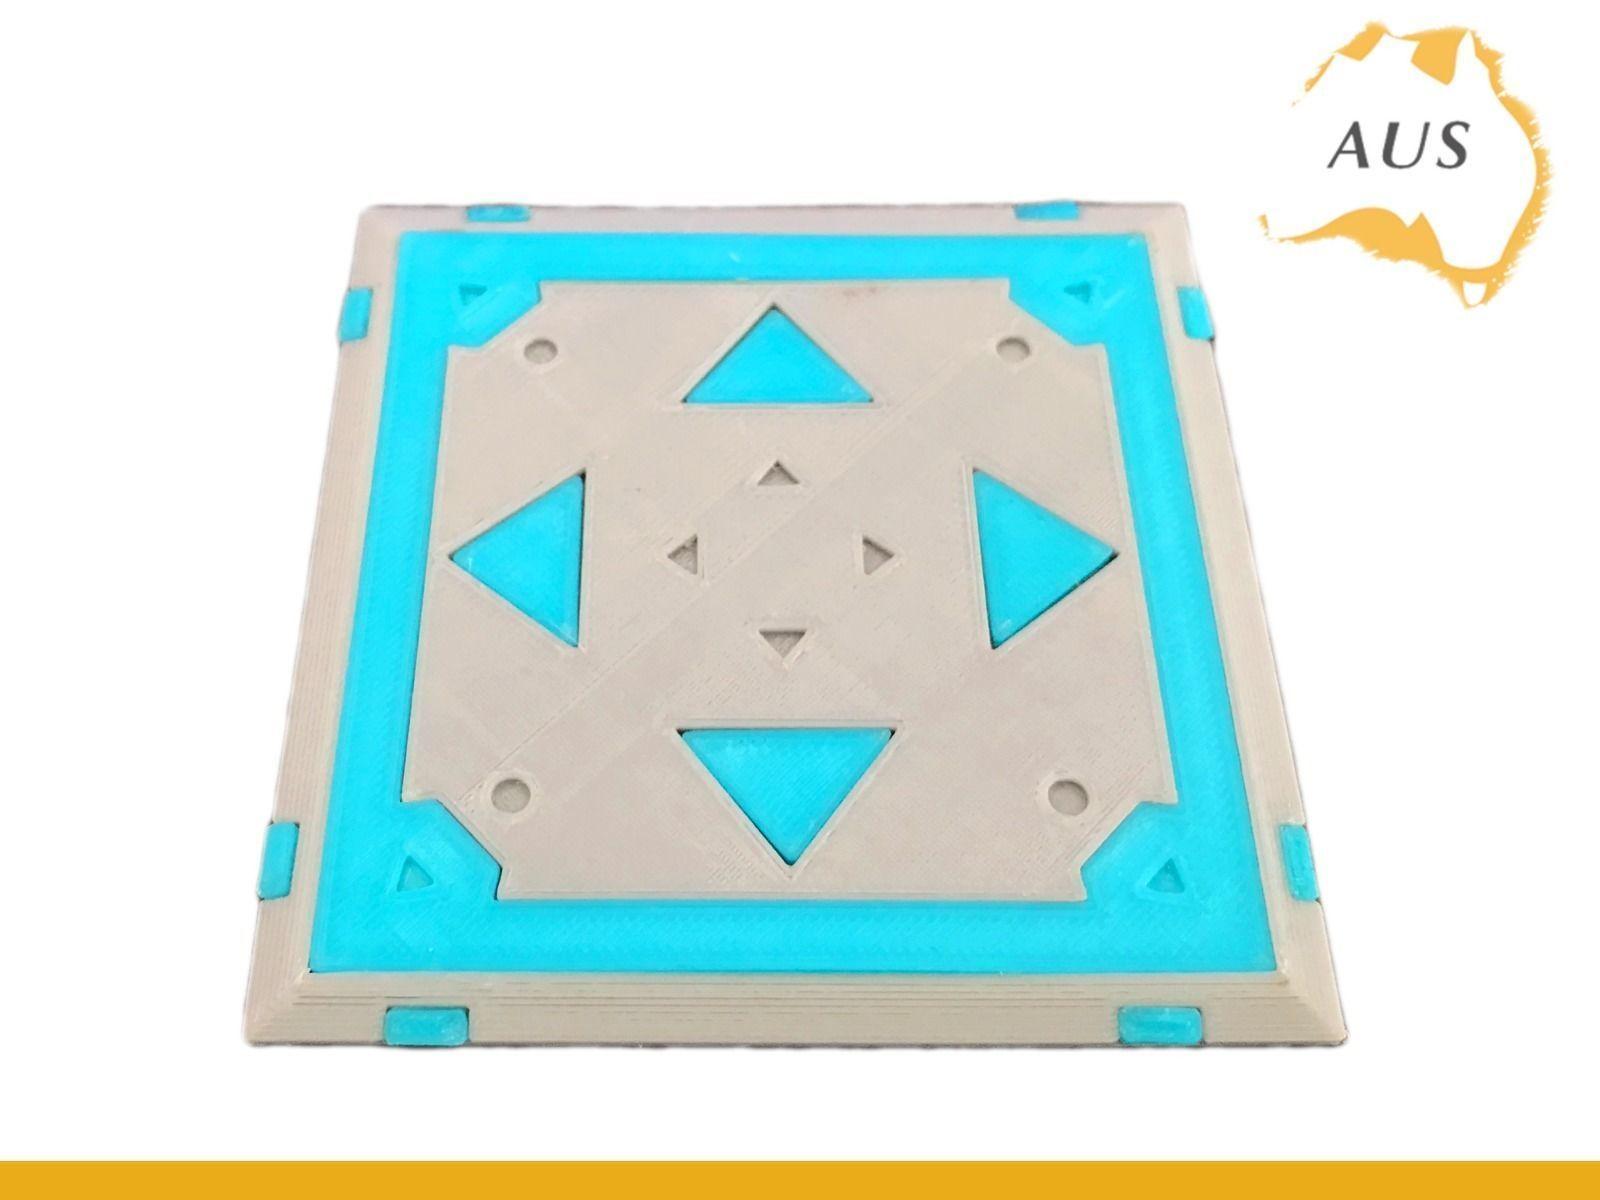 fortnite bounce pad drink coaster prop xbox ps4 3d model stl 3 - miniature fortnite 3d xbox